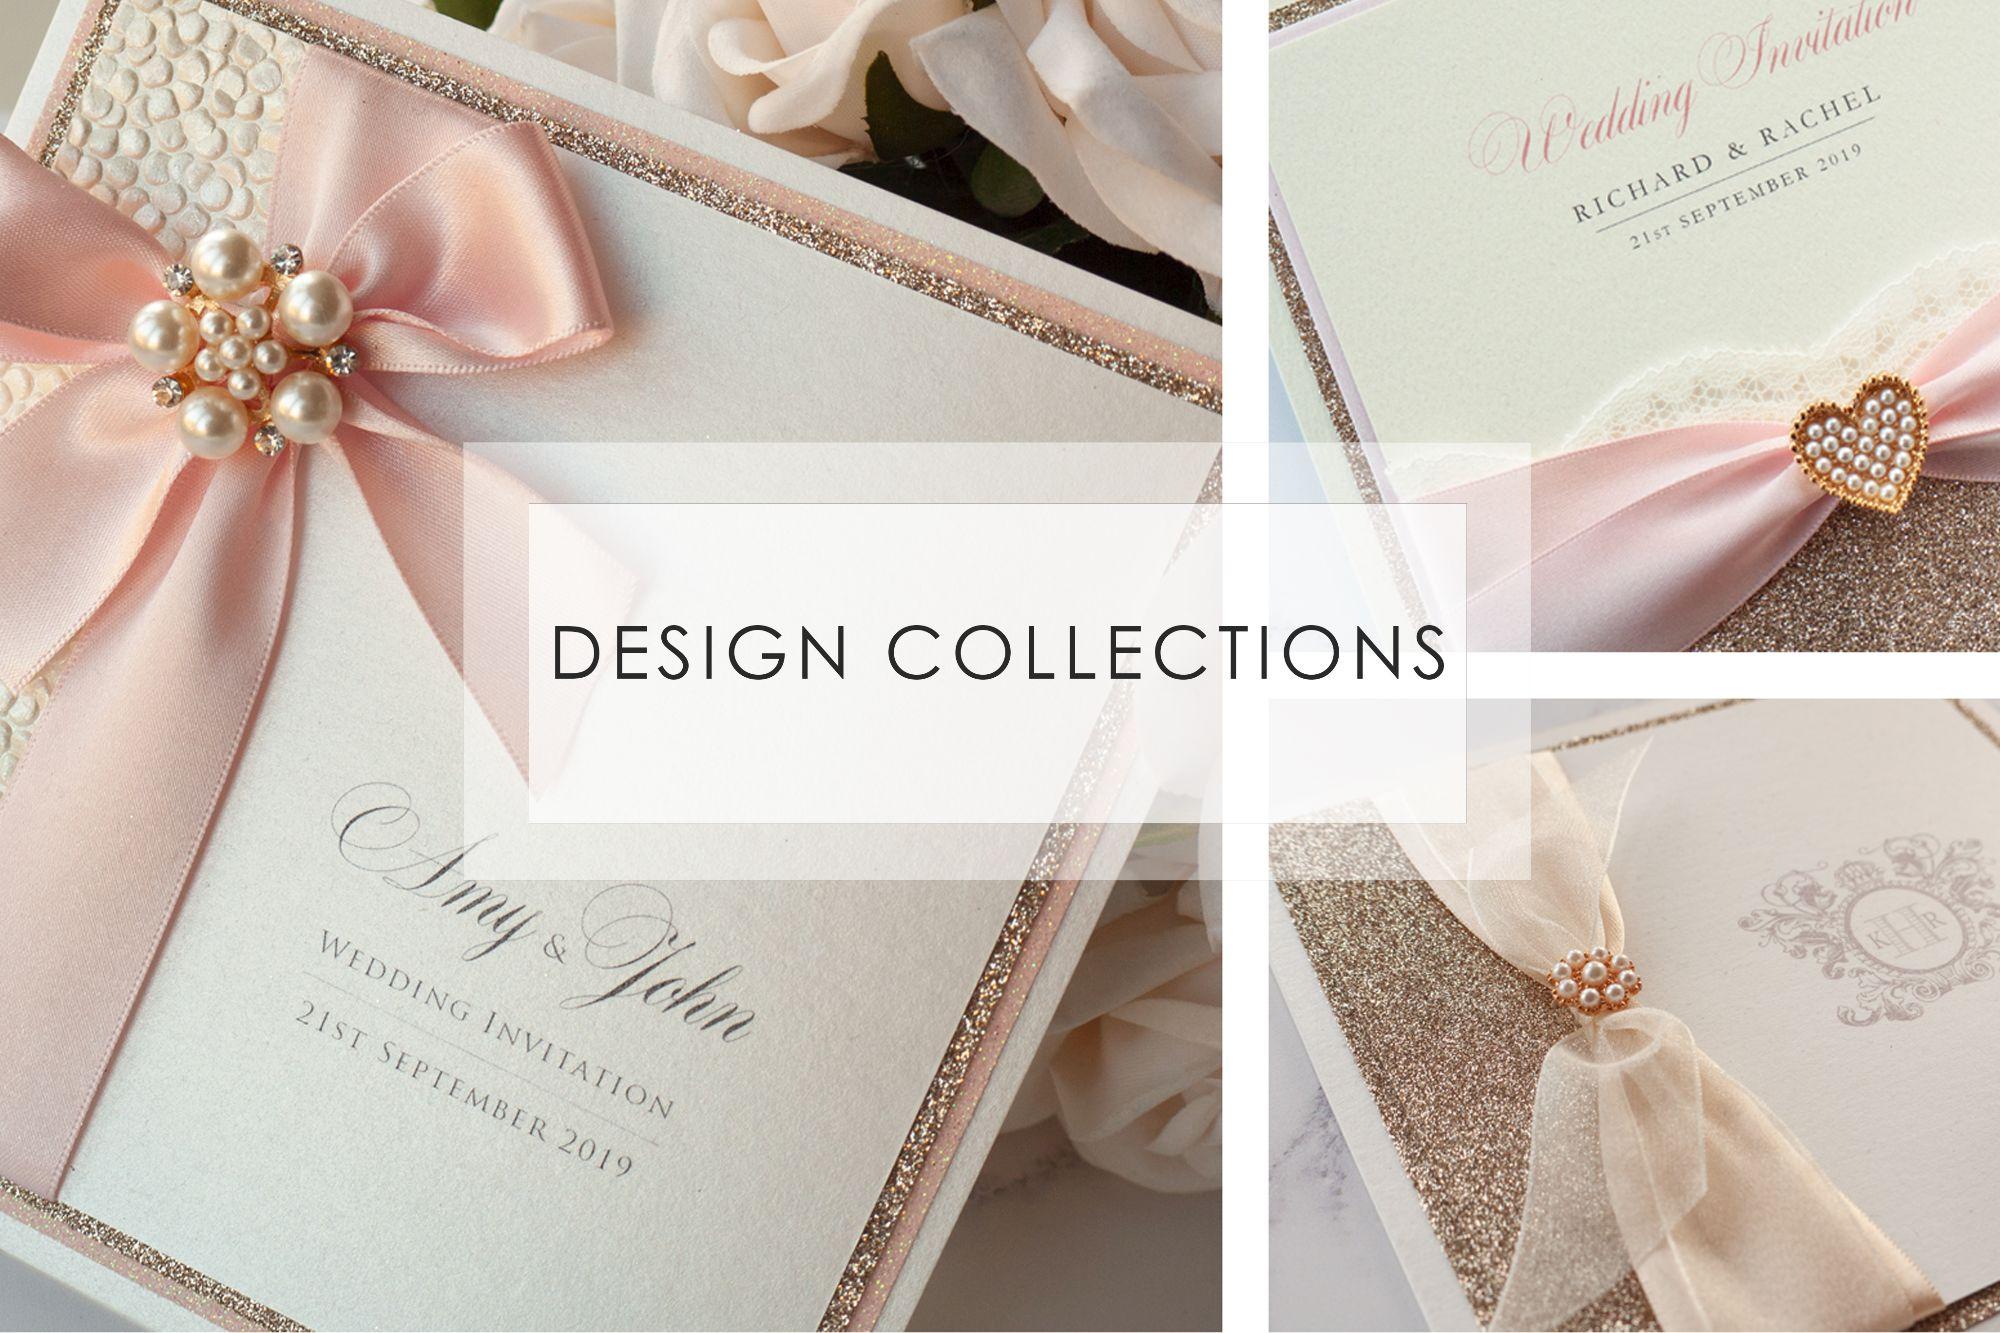 Luxury Wedding Invitations.Luxury Handmade Wedding Invitations And Stationery